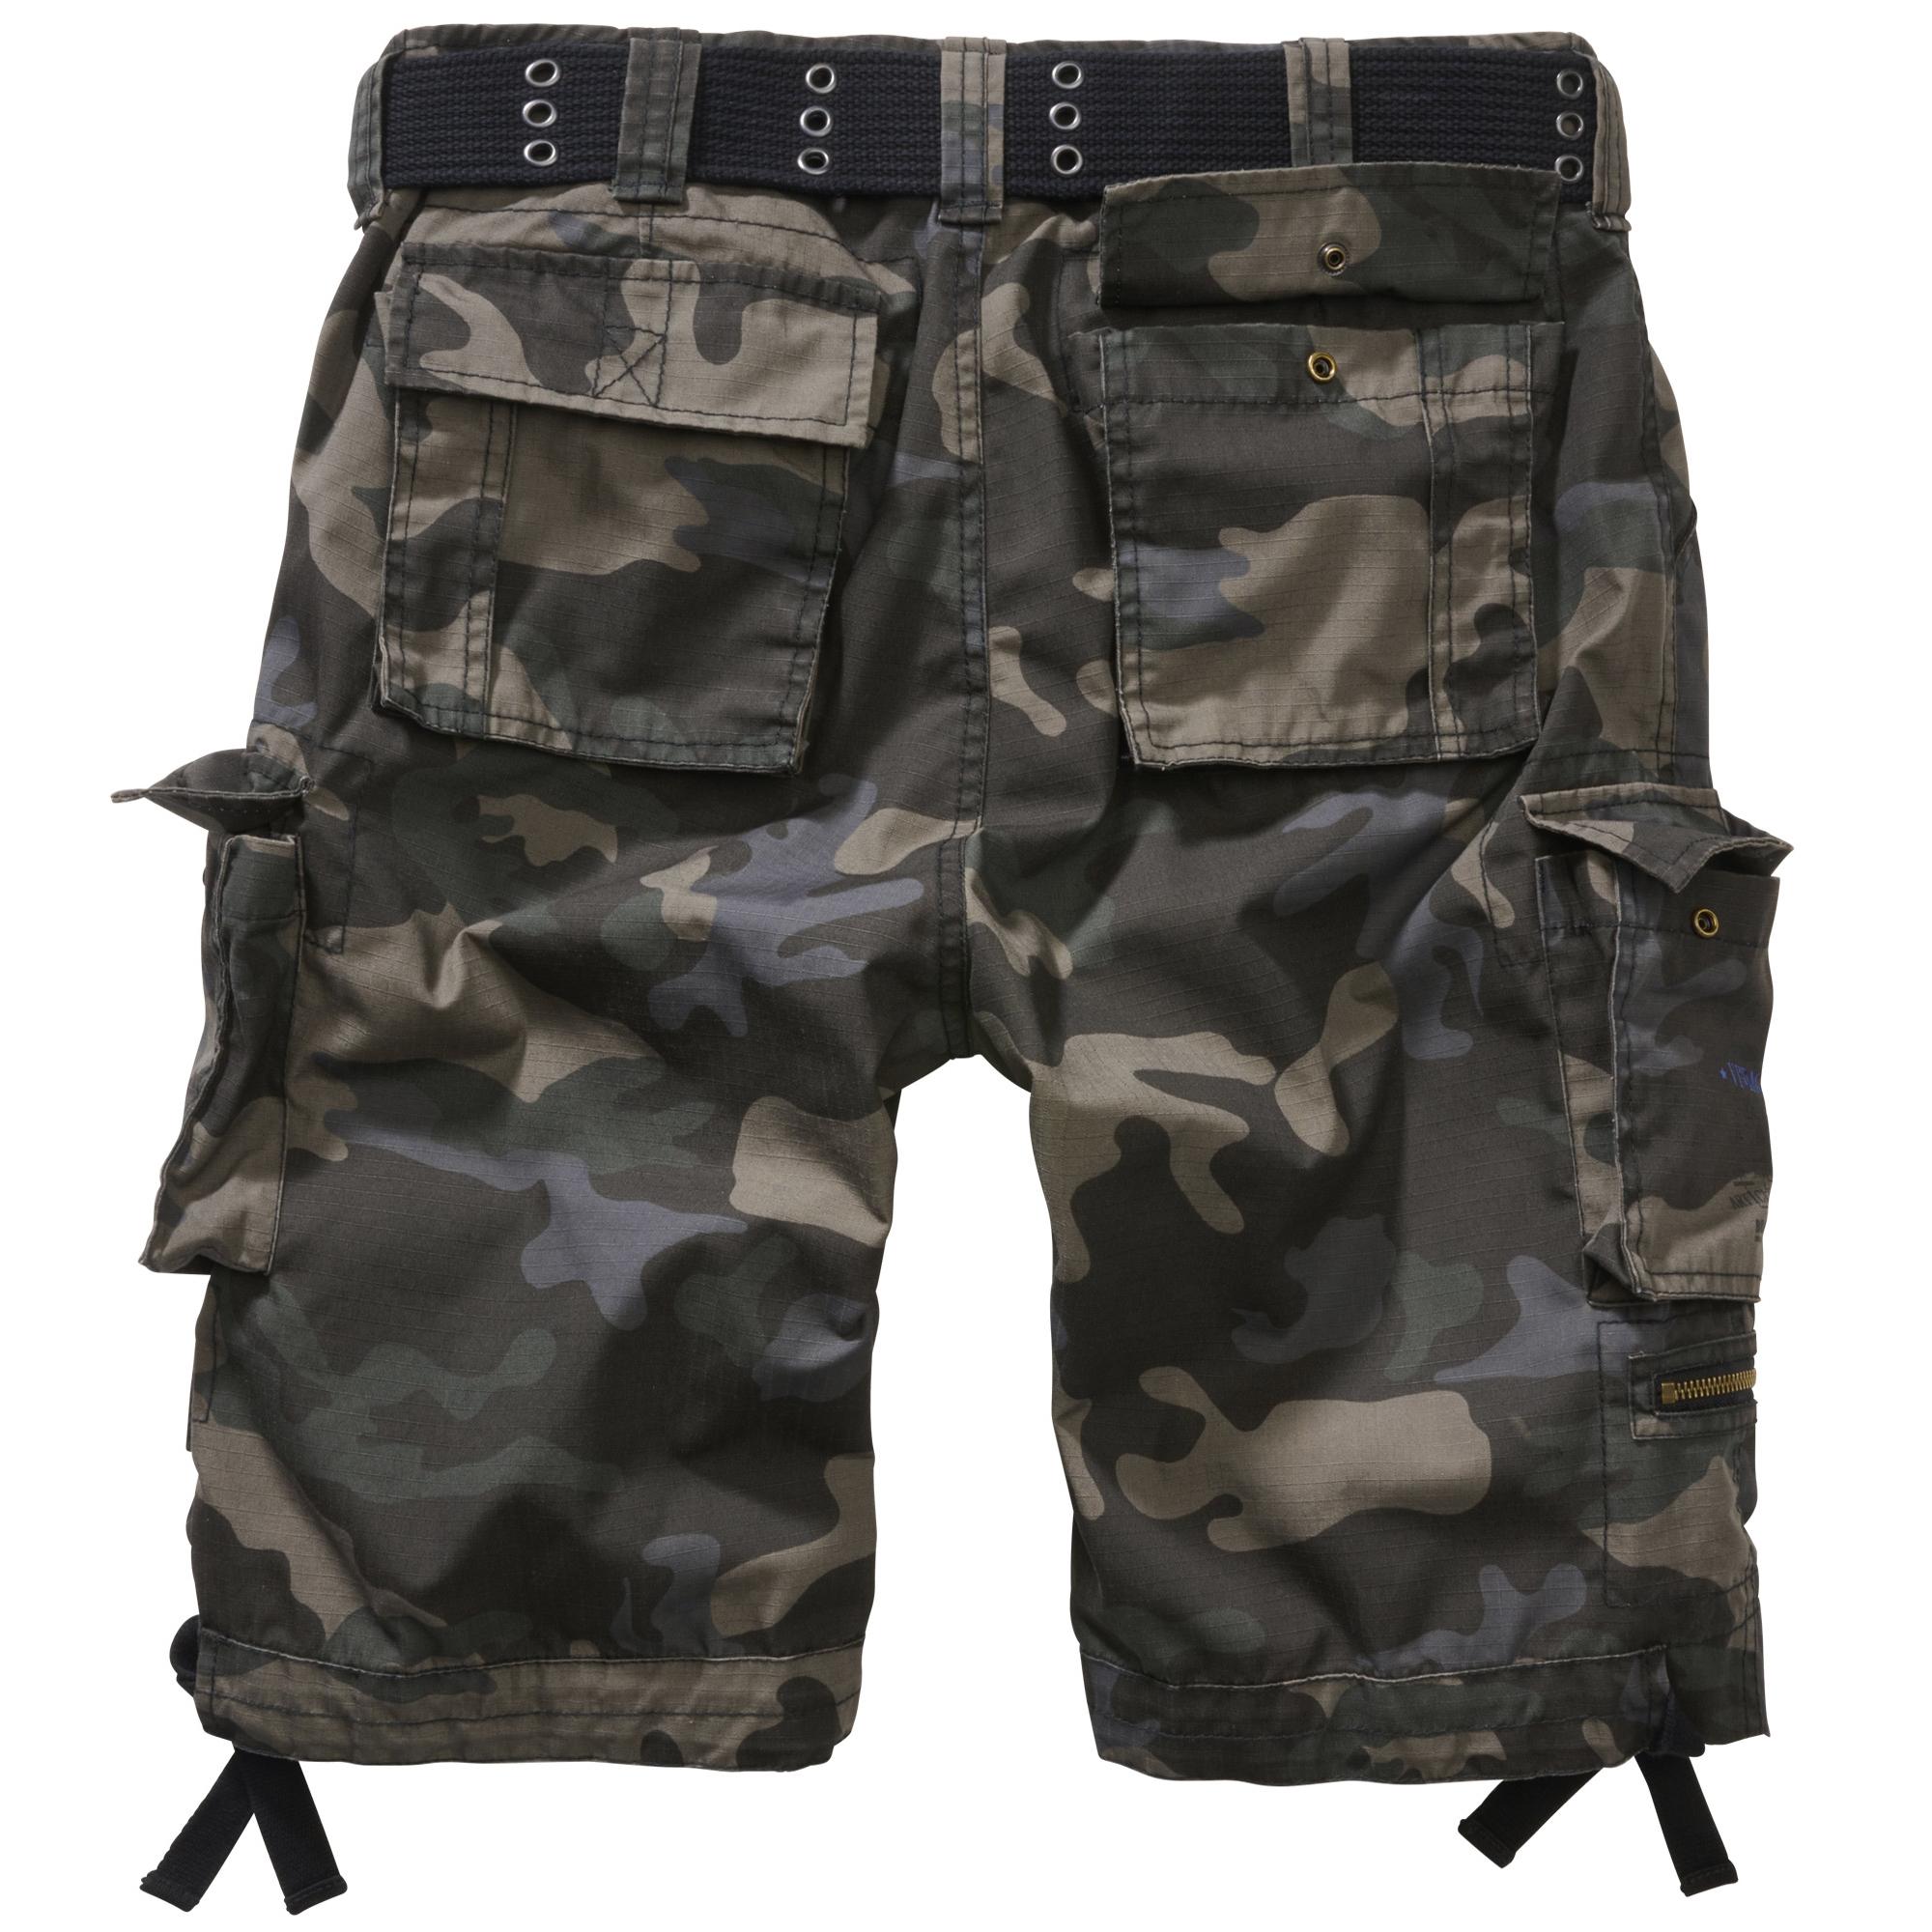 Brandit-Urban-Legend-Herren-Cargo-Shorts-Bermuda-Kurze-Hose-Short-US-Army Indexbild 12